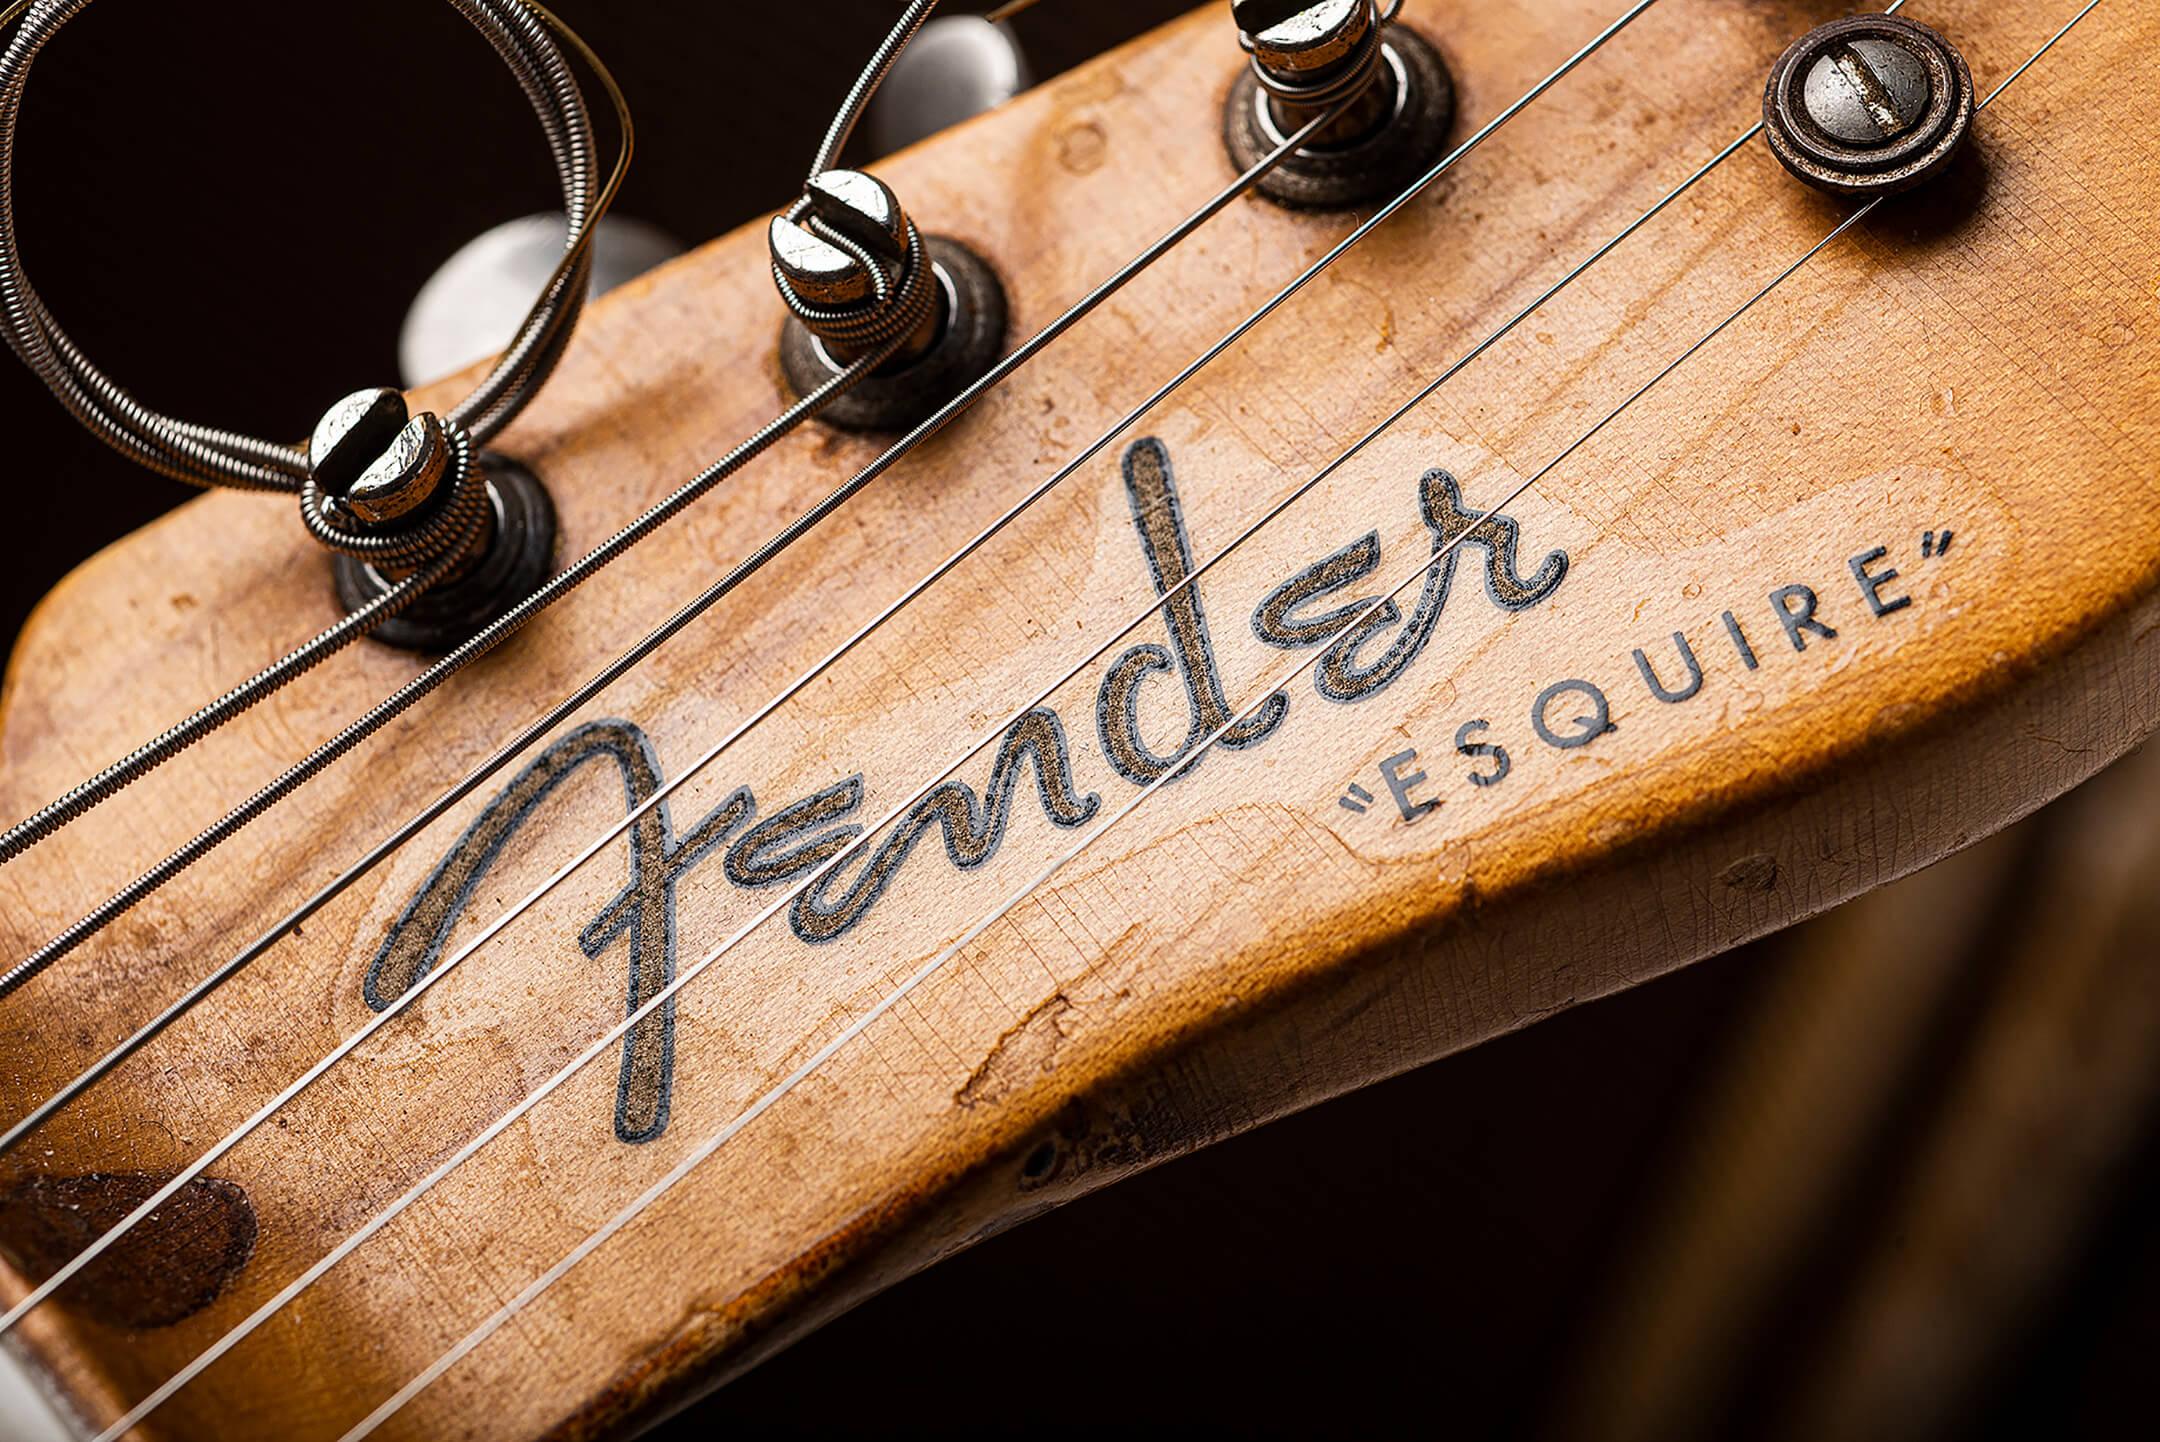 Eddie Tatton's 1952 Fender Esquire Blackguard Telecaster